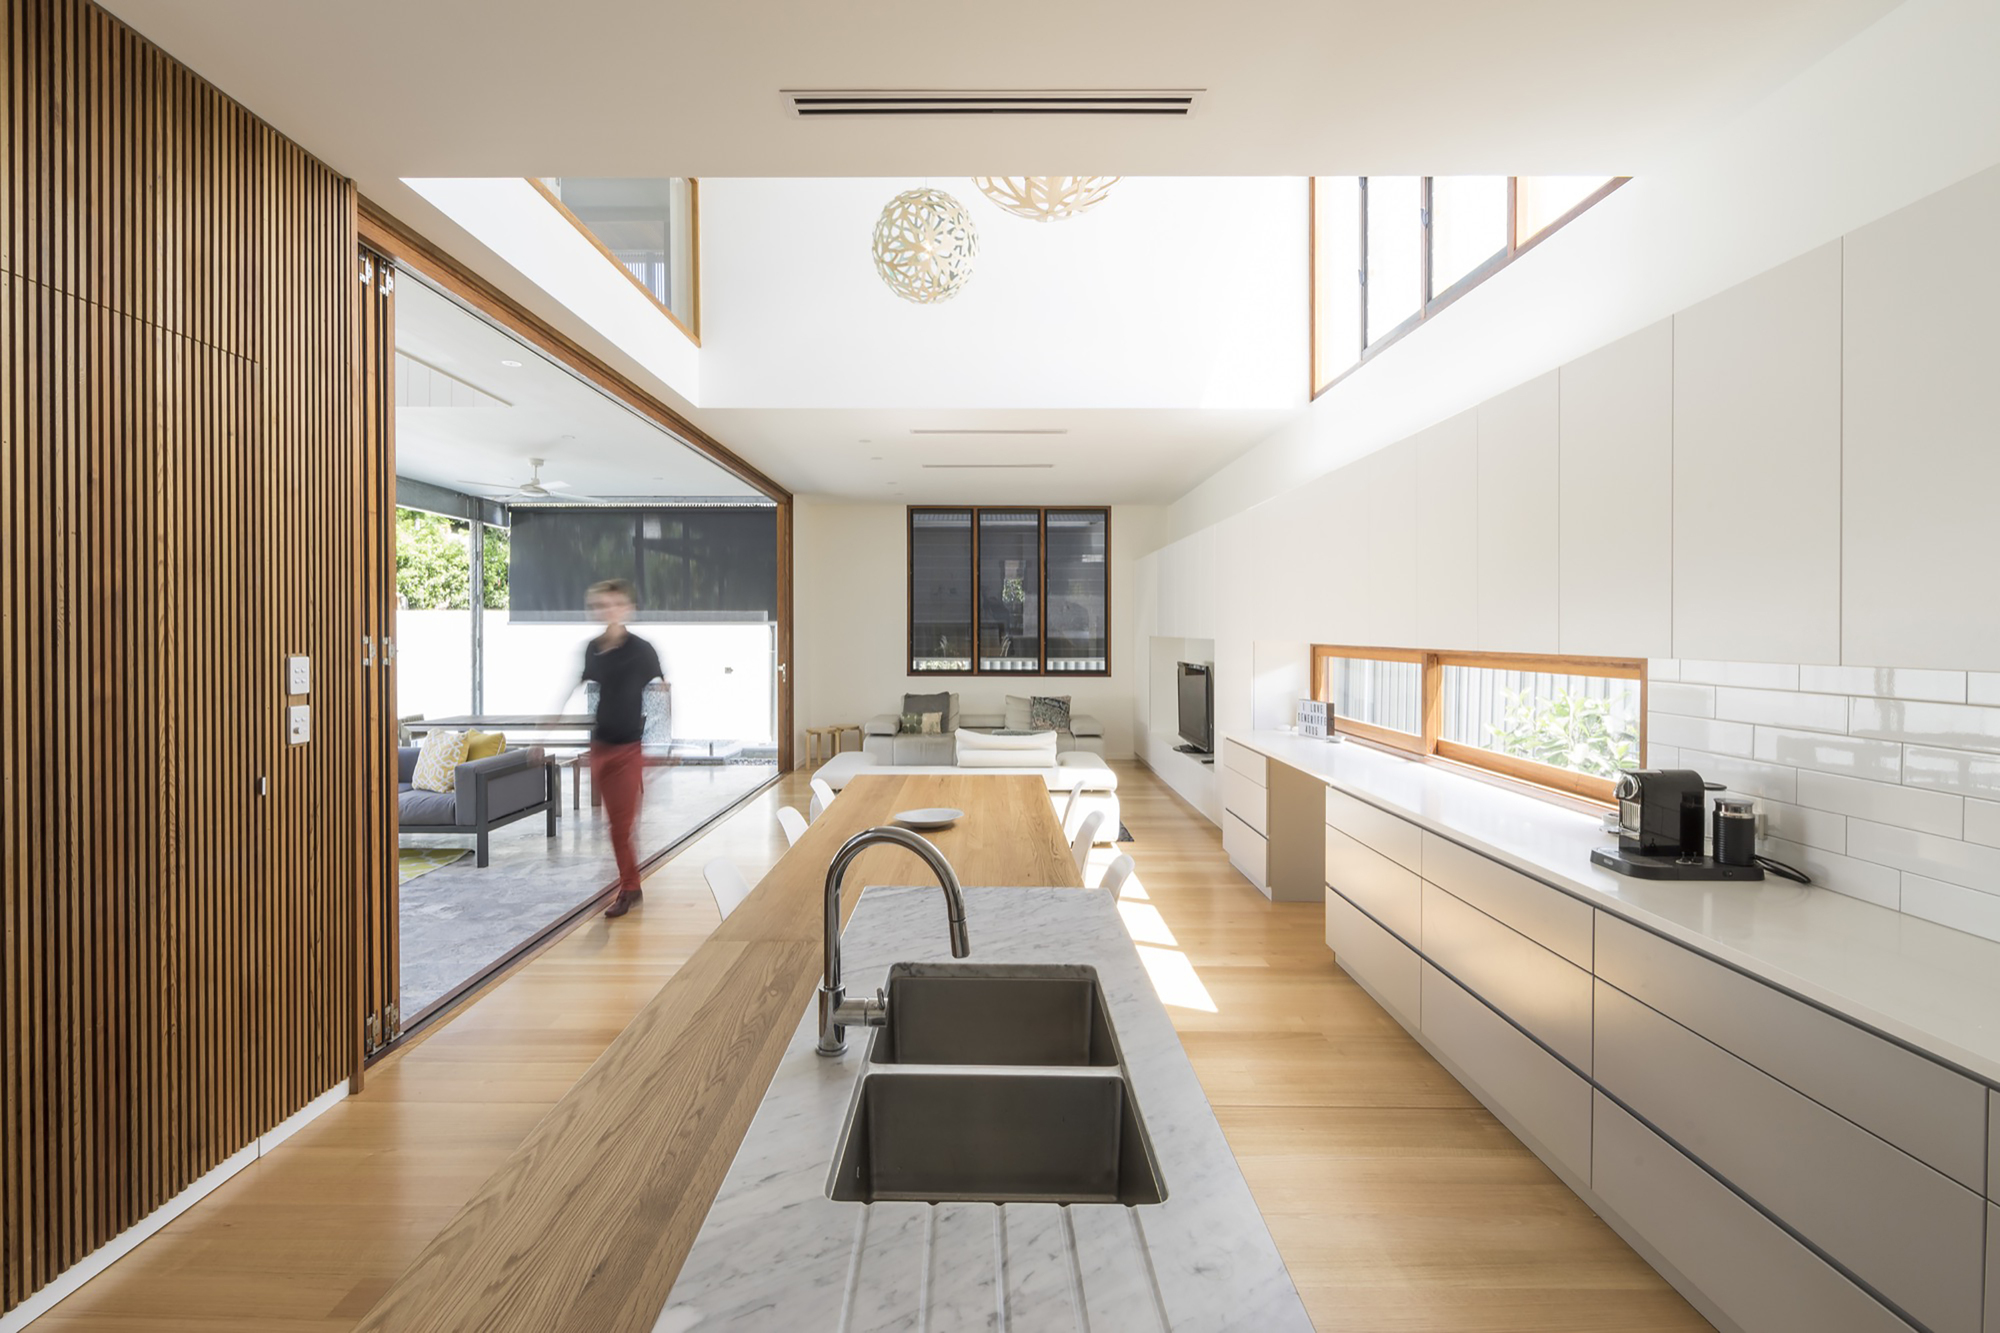 Charming Backyard Architect Part - 5: Courtesy Of Joe Adsett Architects